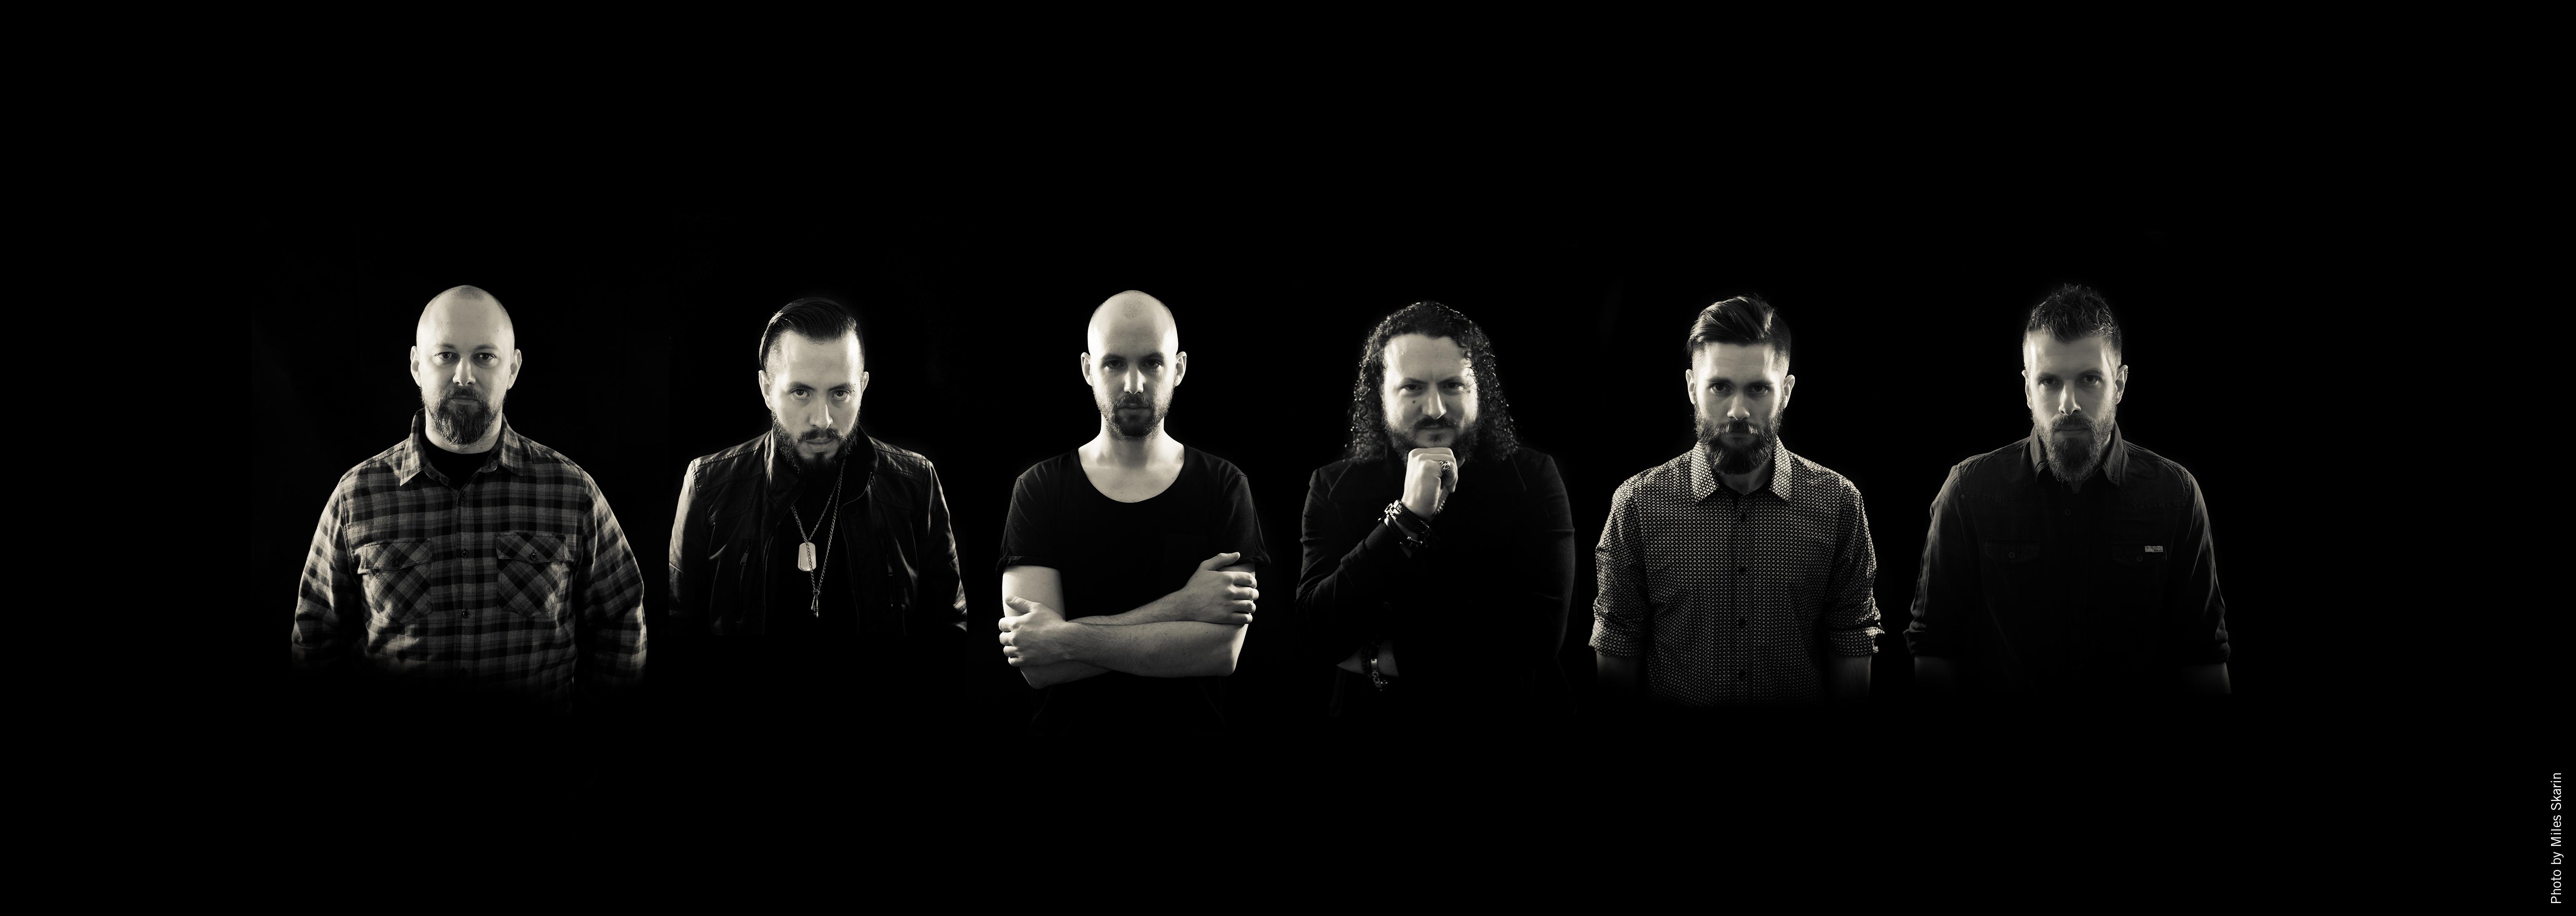 Band Photo - Haken